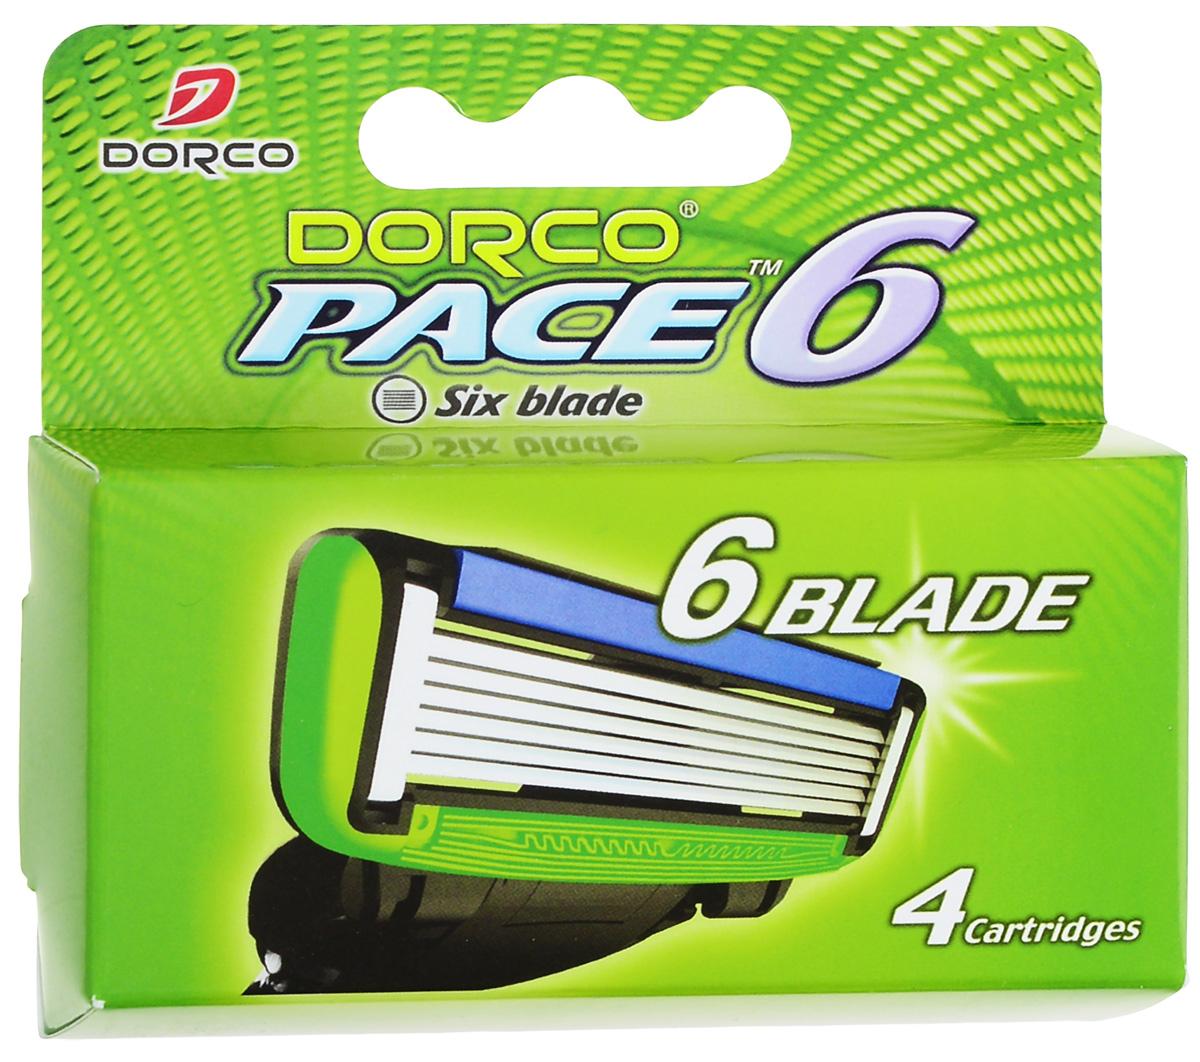 Dorco Kассеты для бритья